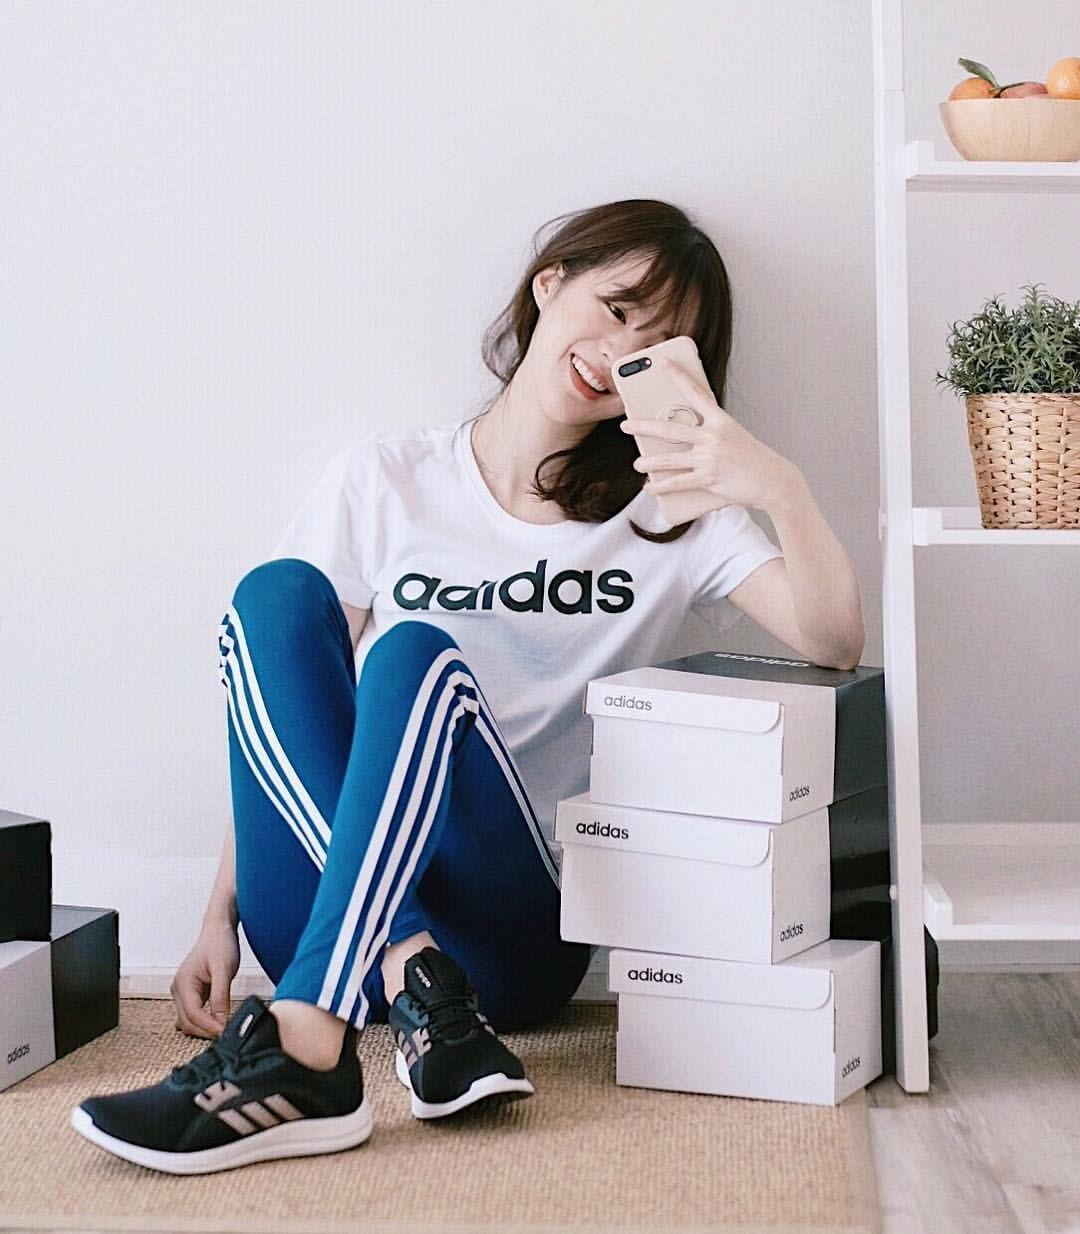 neo adidas instagram